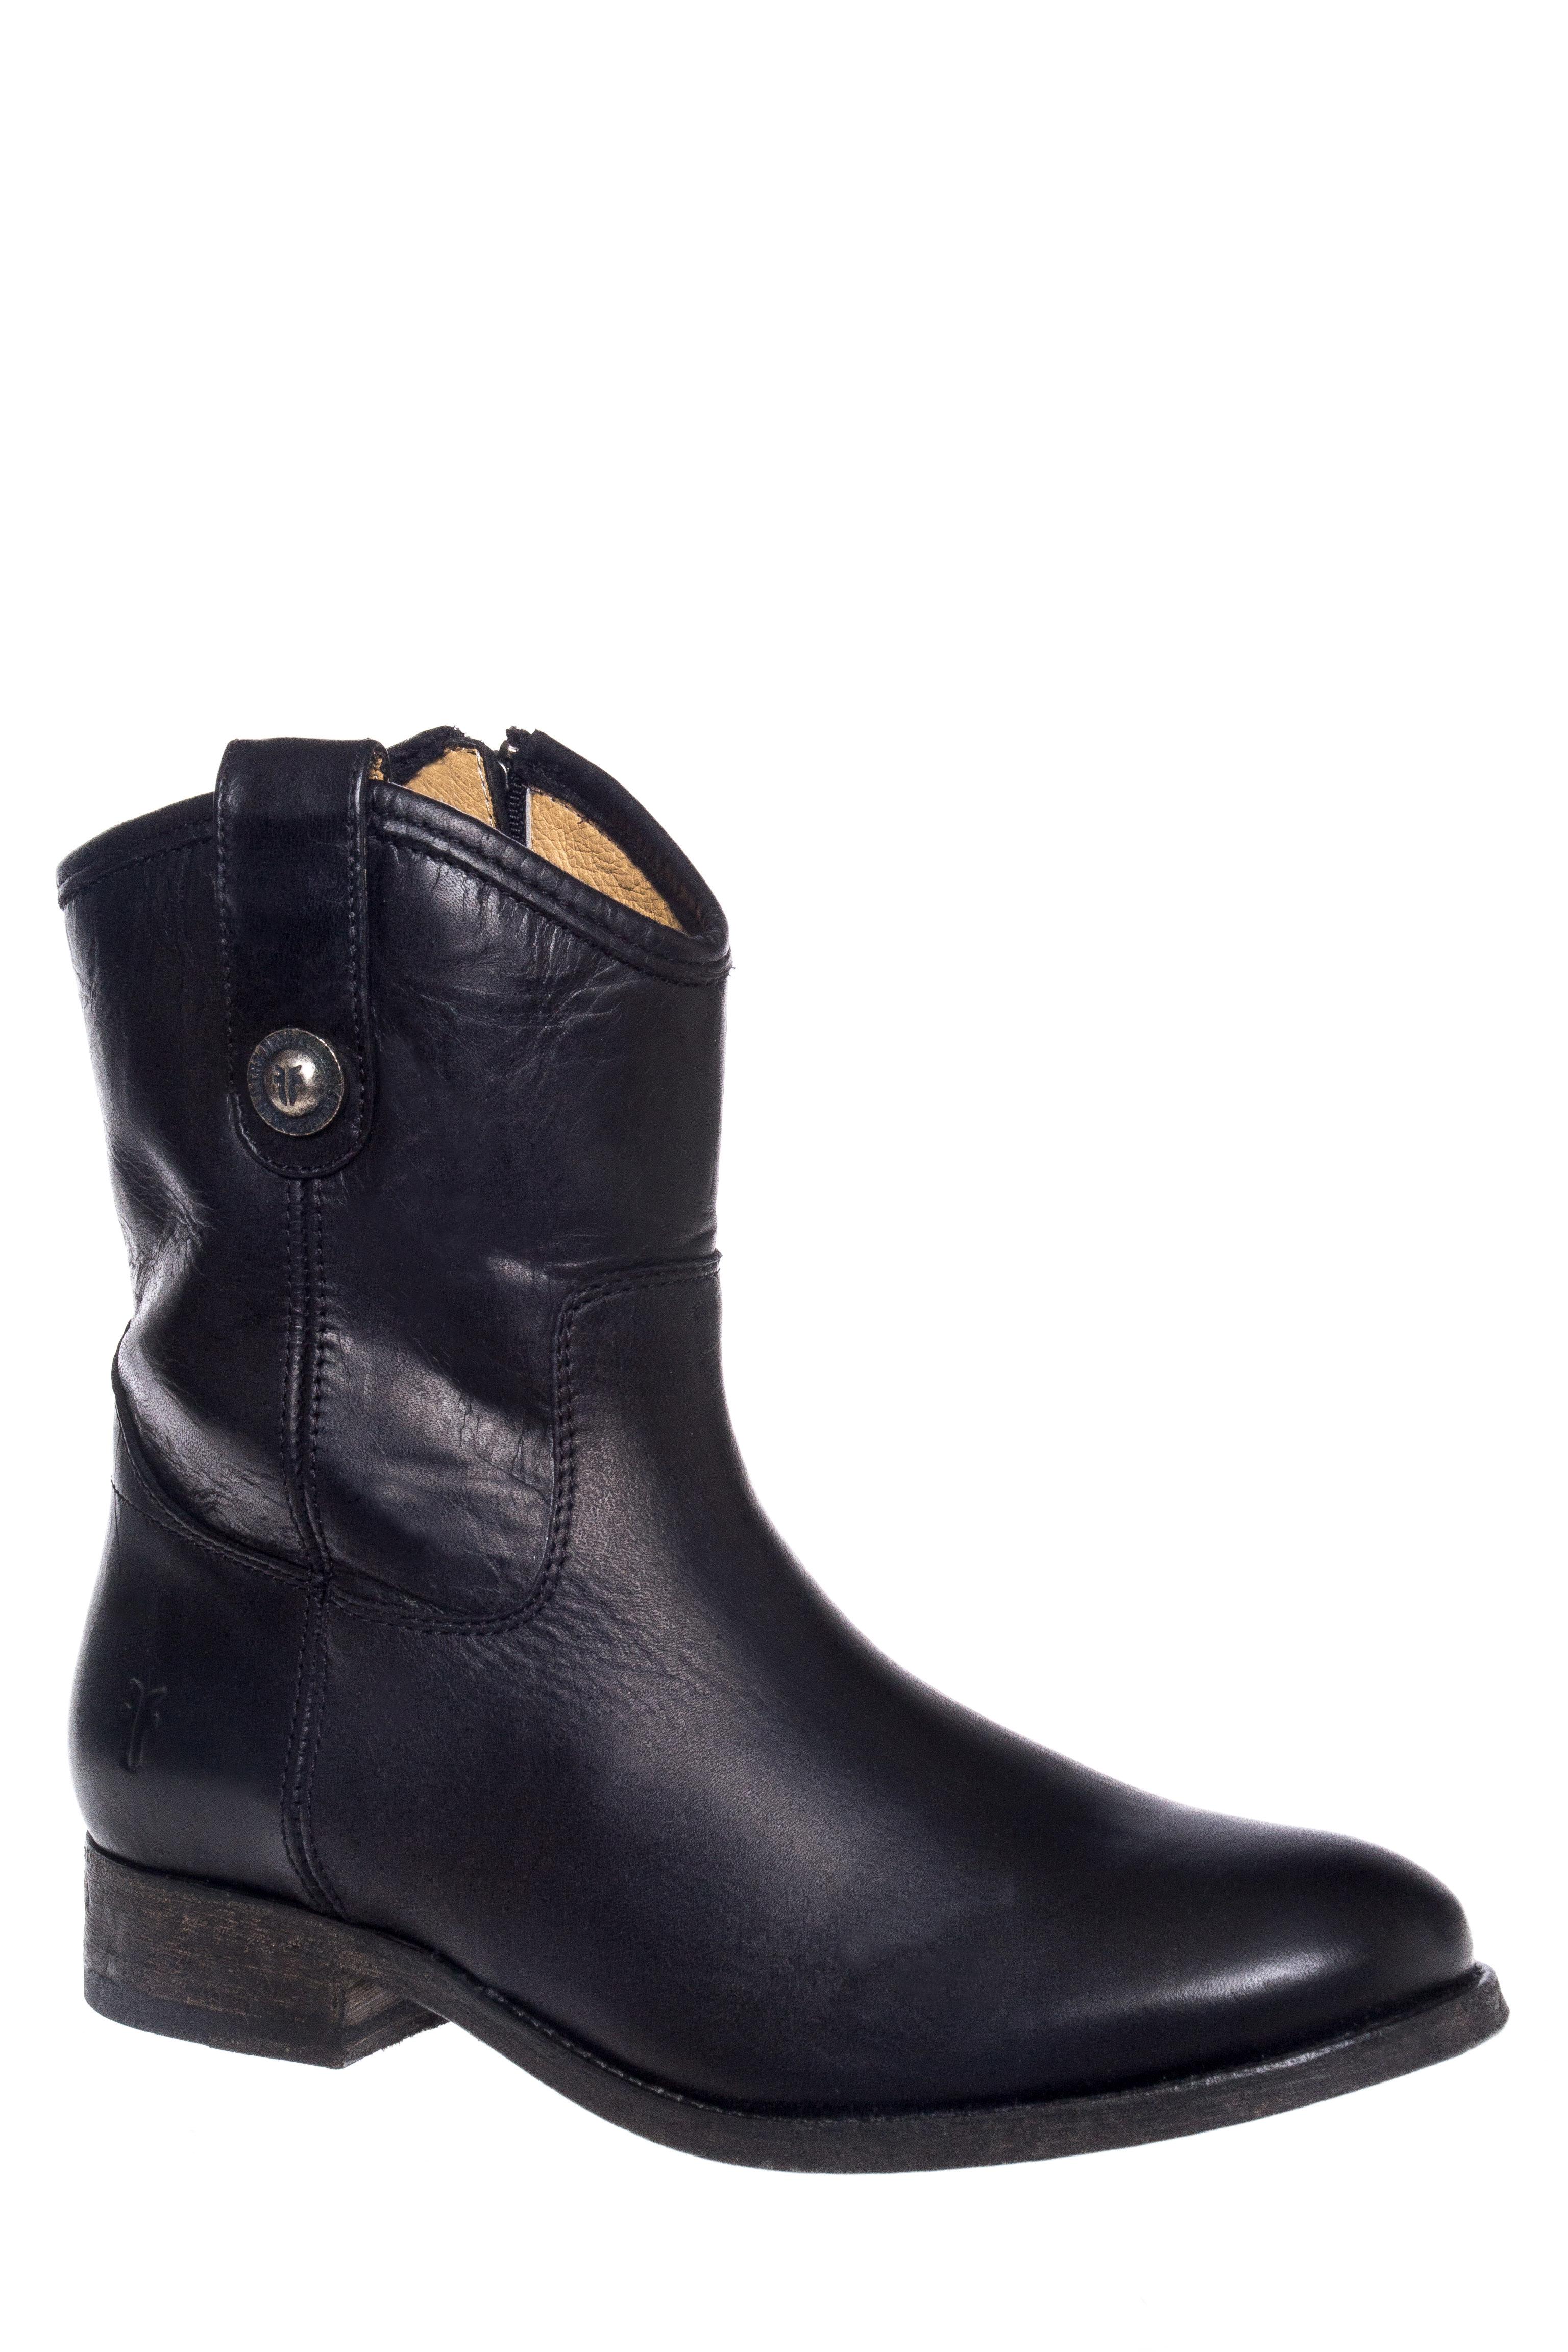 Frye Melissa Button Short Zip Boots - Black